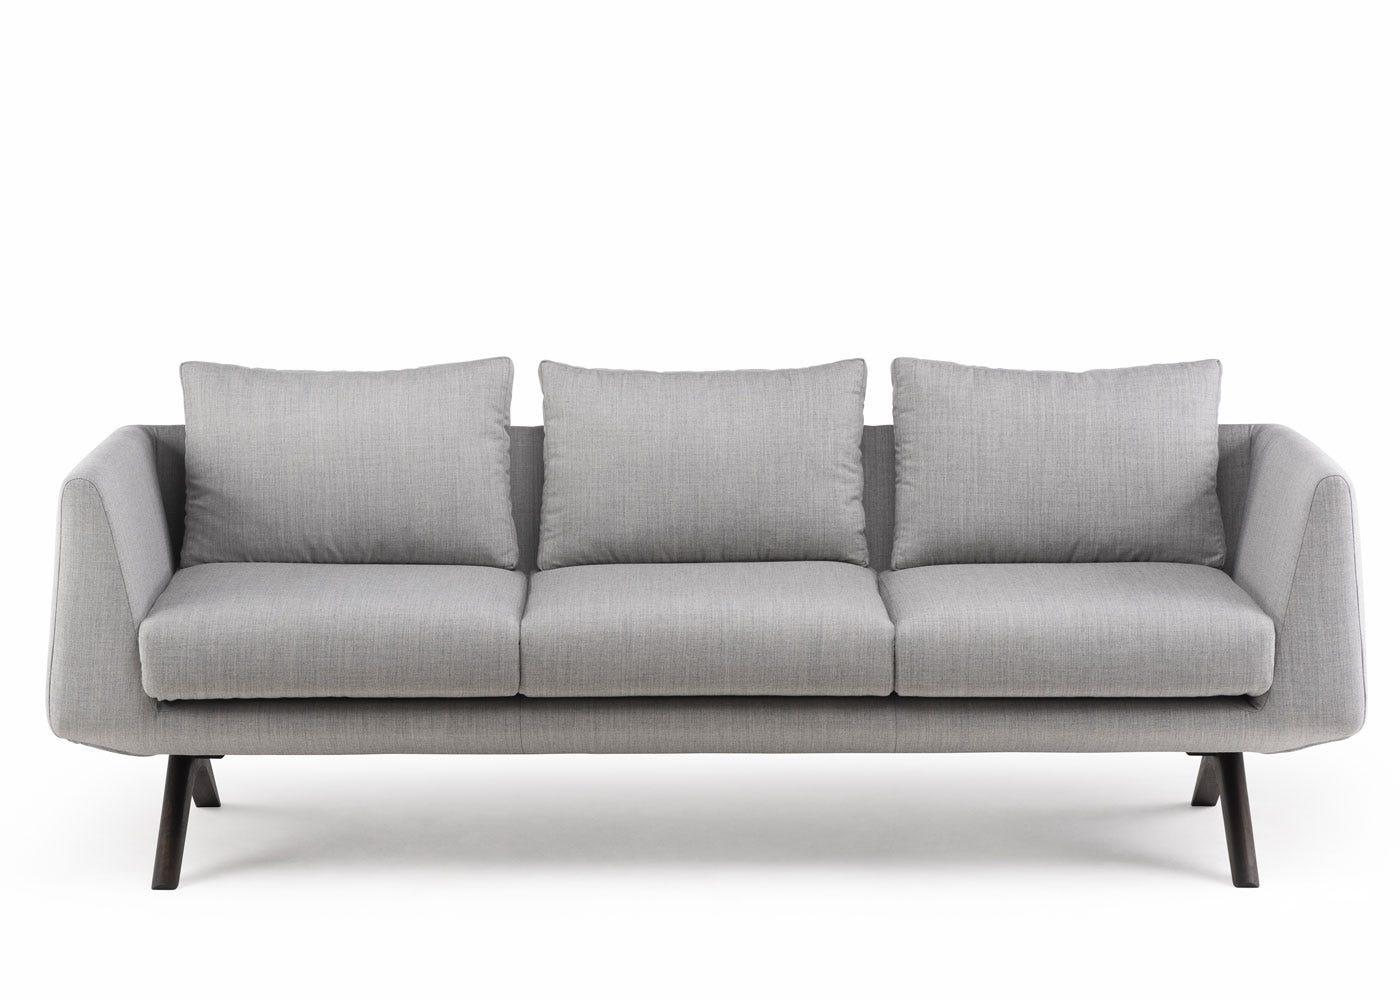 De La Espada Matthew Hilton Hepburn Sofa Black Oiled Walnut Grey Canvas 124